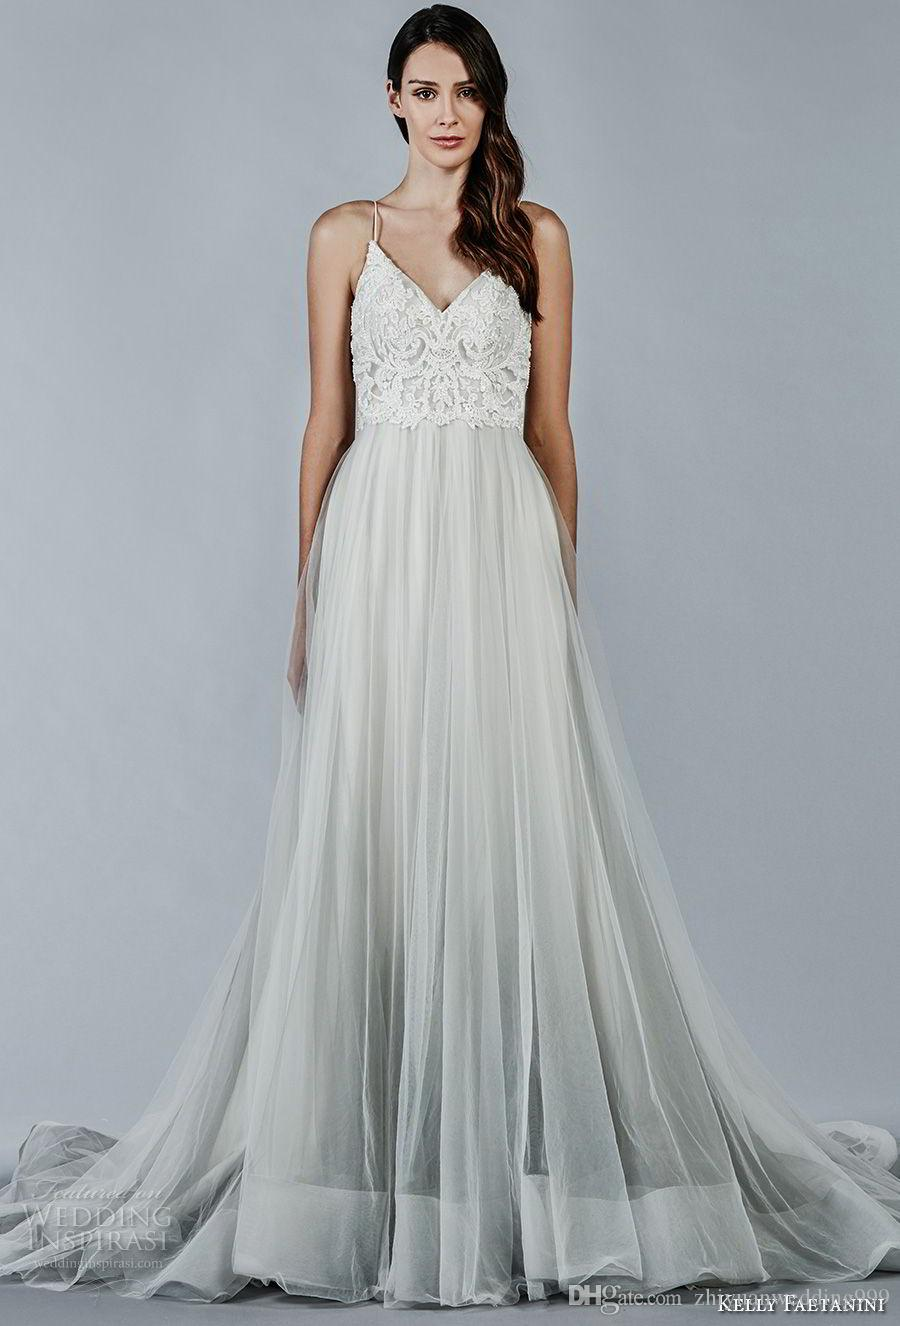 Discount Romantic Tulle Skirt Wedding Dresses 2018 Kelly Faetanini ...